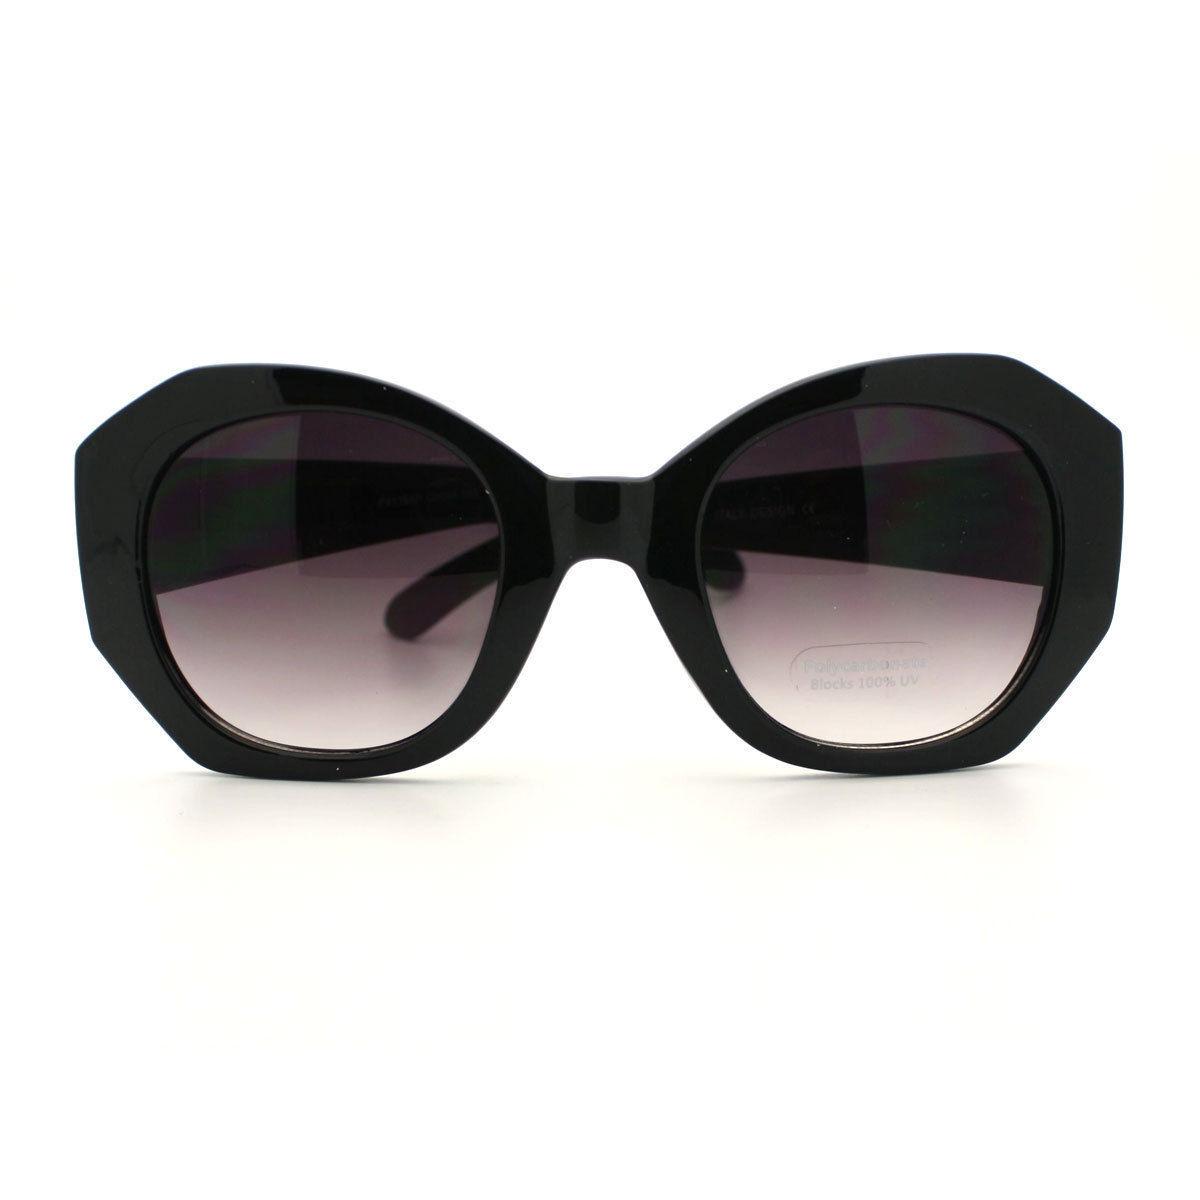 Womens Sunglasses Oversized Unique Diamond Cut Frame High Fashion Eyewear